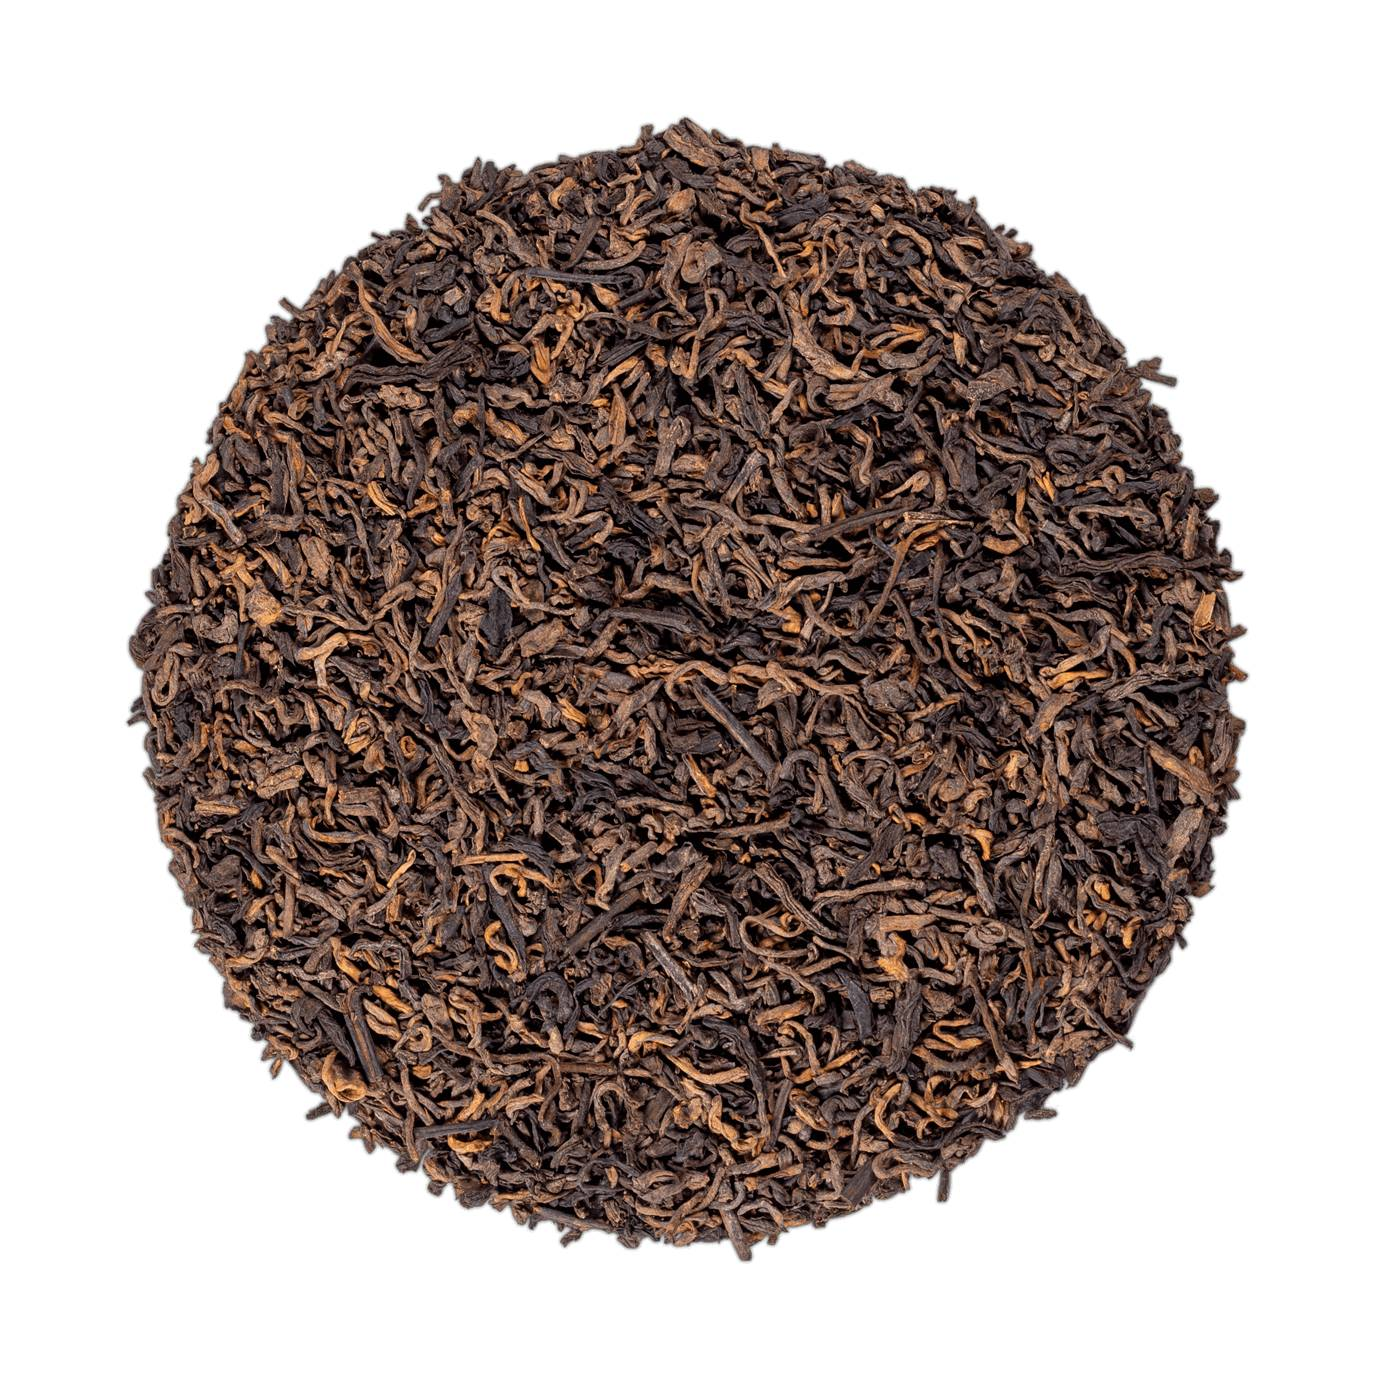 KUSMI TEA Pu Erh bio - Thé sombre fermenté de Chine - Thé en vrac - Kusmi Tea